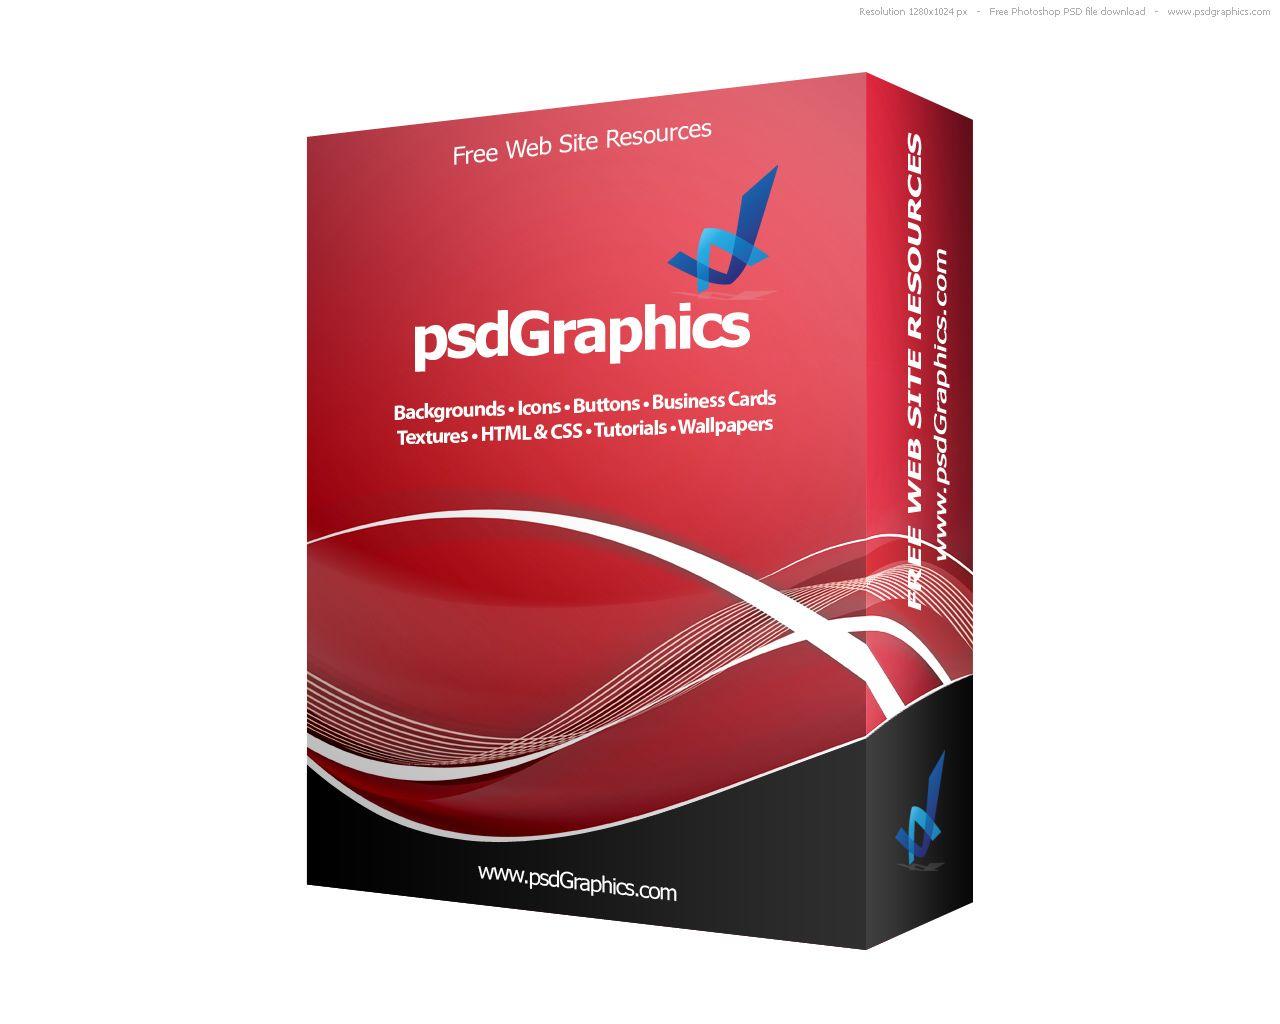 3502+ Software Box Mockup Psd Free Download Popular Mockups